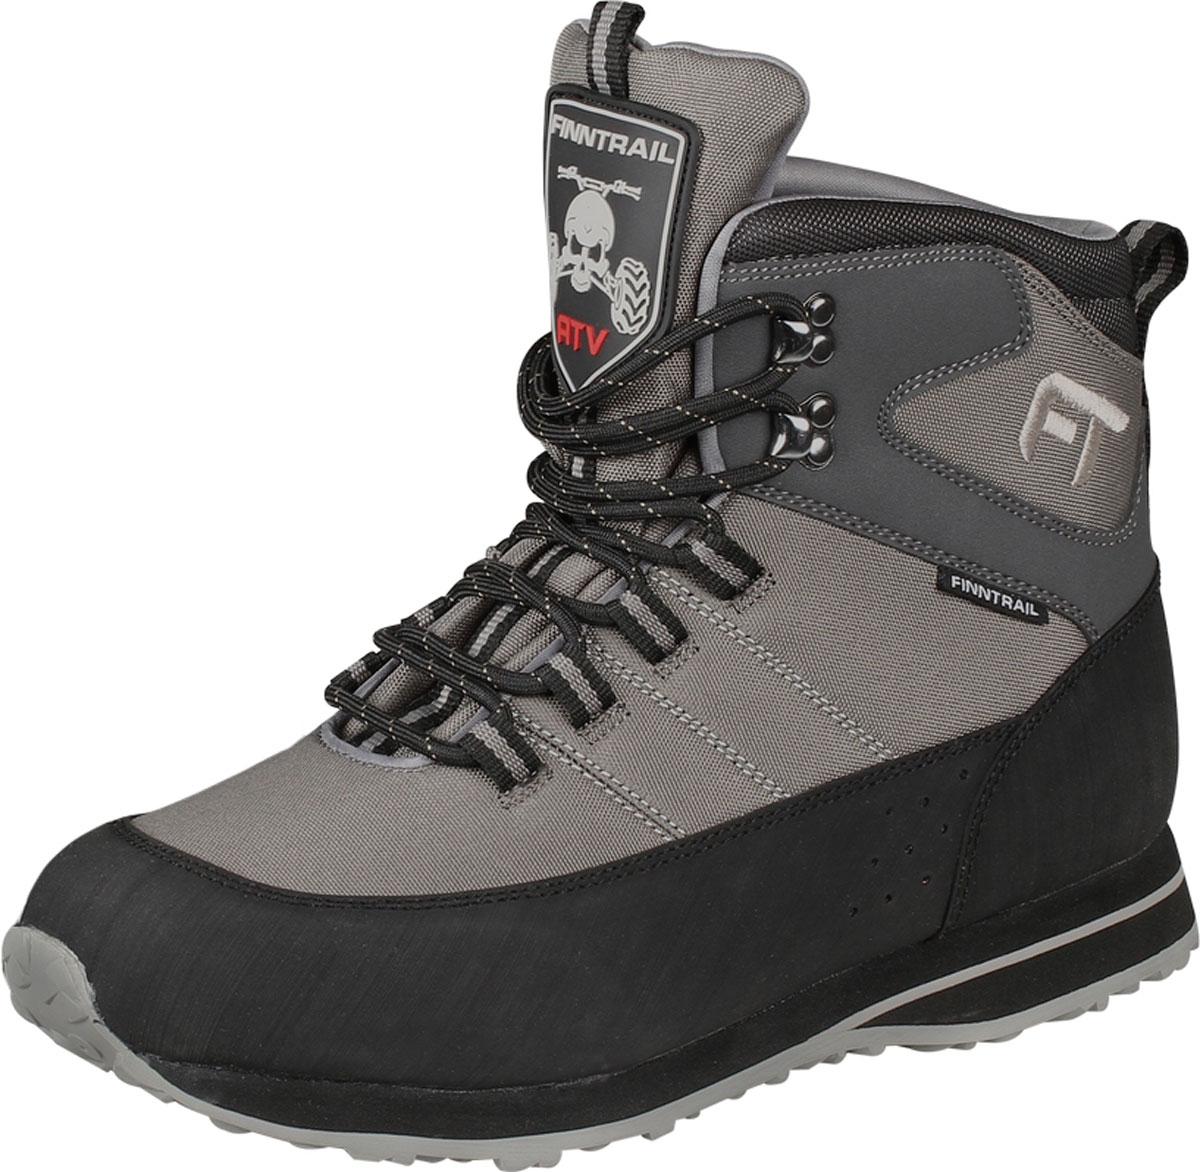 Ботинки для рыбалки Finntrail New Stalker, цвет: серый, черный. 5192. Размер 45